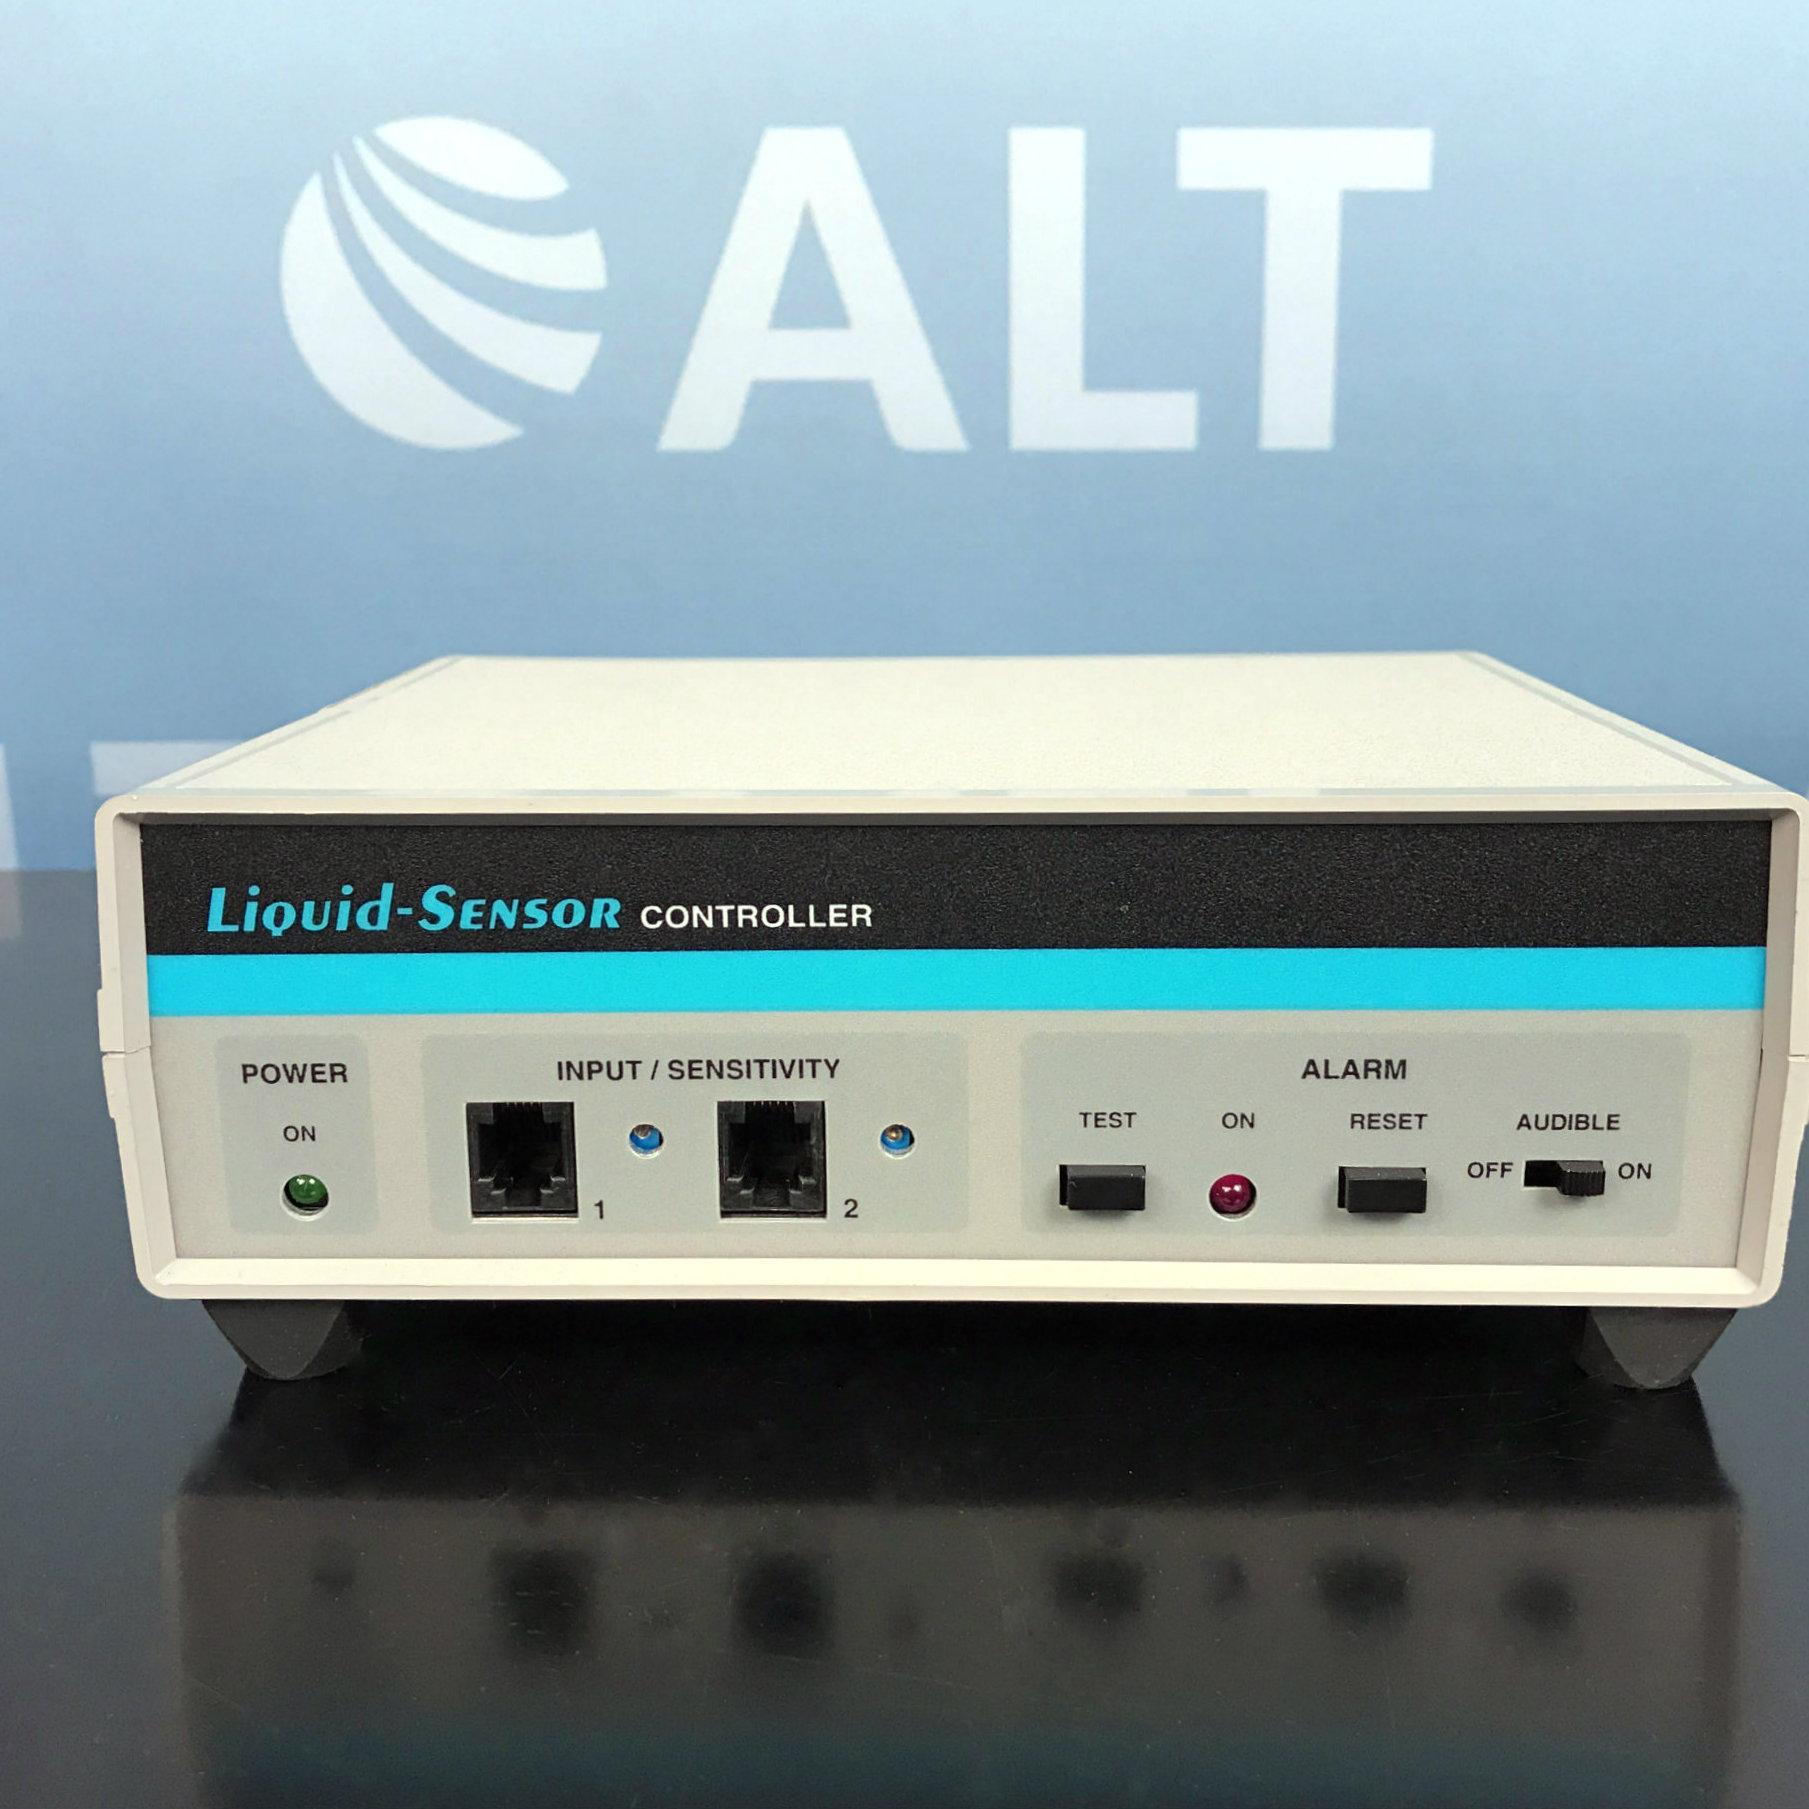 877-9600 Liquid-Sensor Controller with Liquid-Pad Detector P/N 877-9500 Name